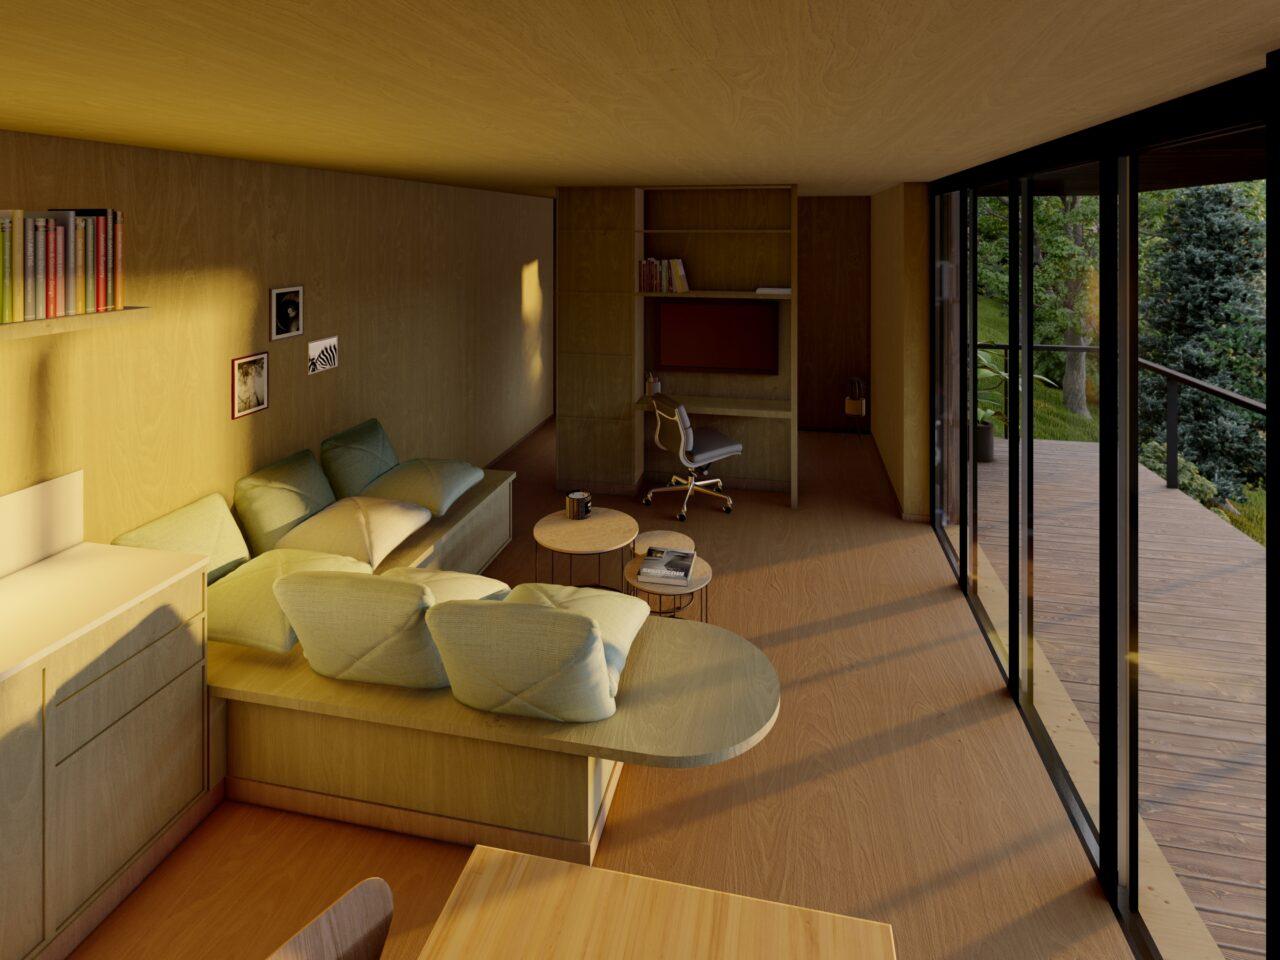 tiny house, vakantiewoning, boomhut, België, Wallonië